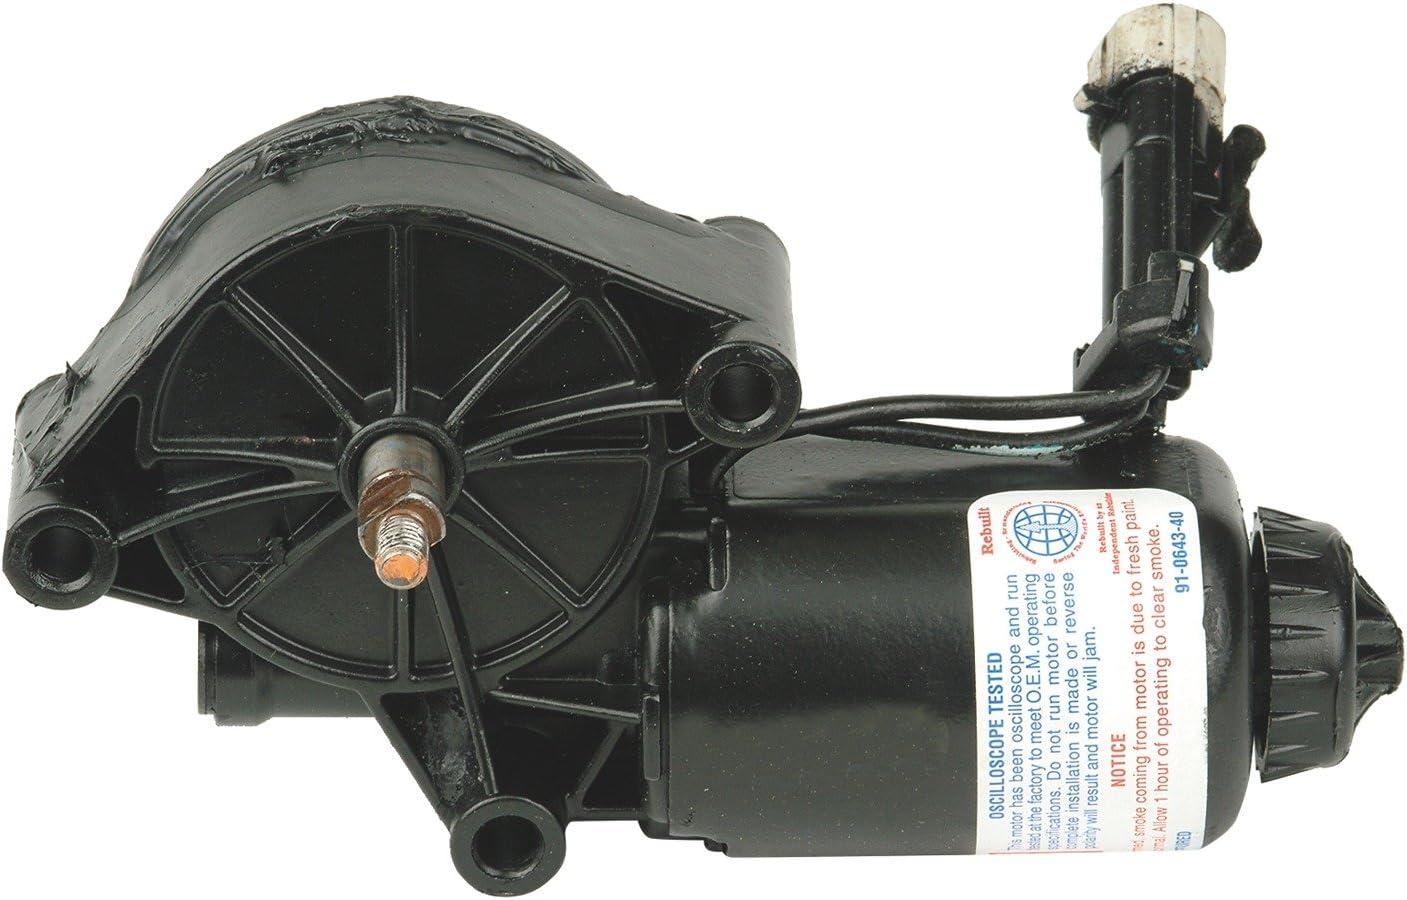 B000C457T8 Cardone 49-120 Remanufactured Headlamp Motor 71Y8k11fqxL.SL1409_